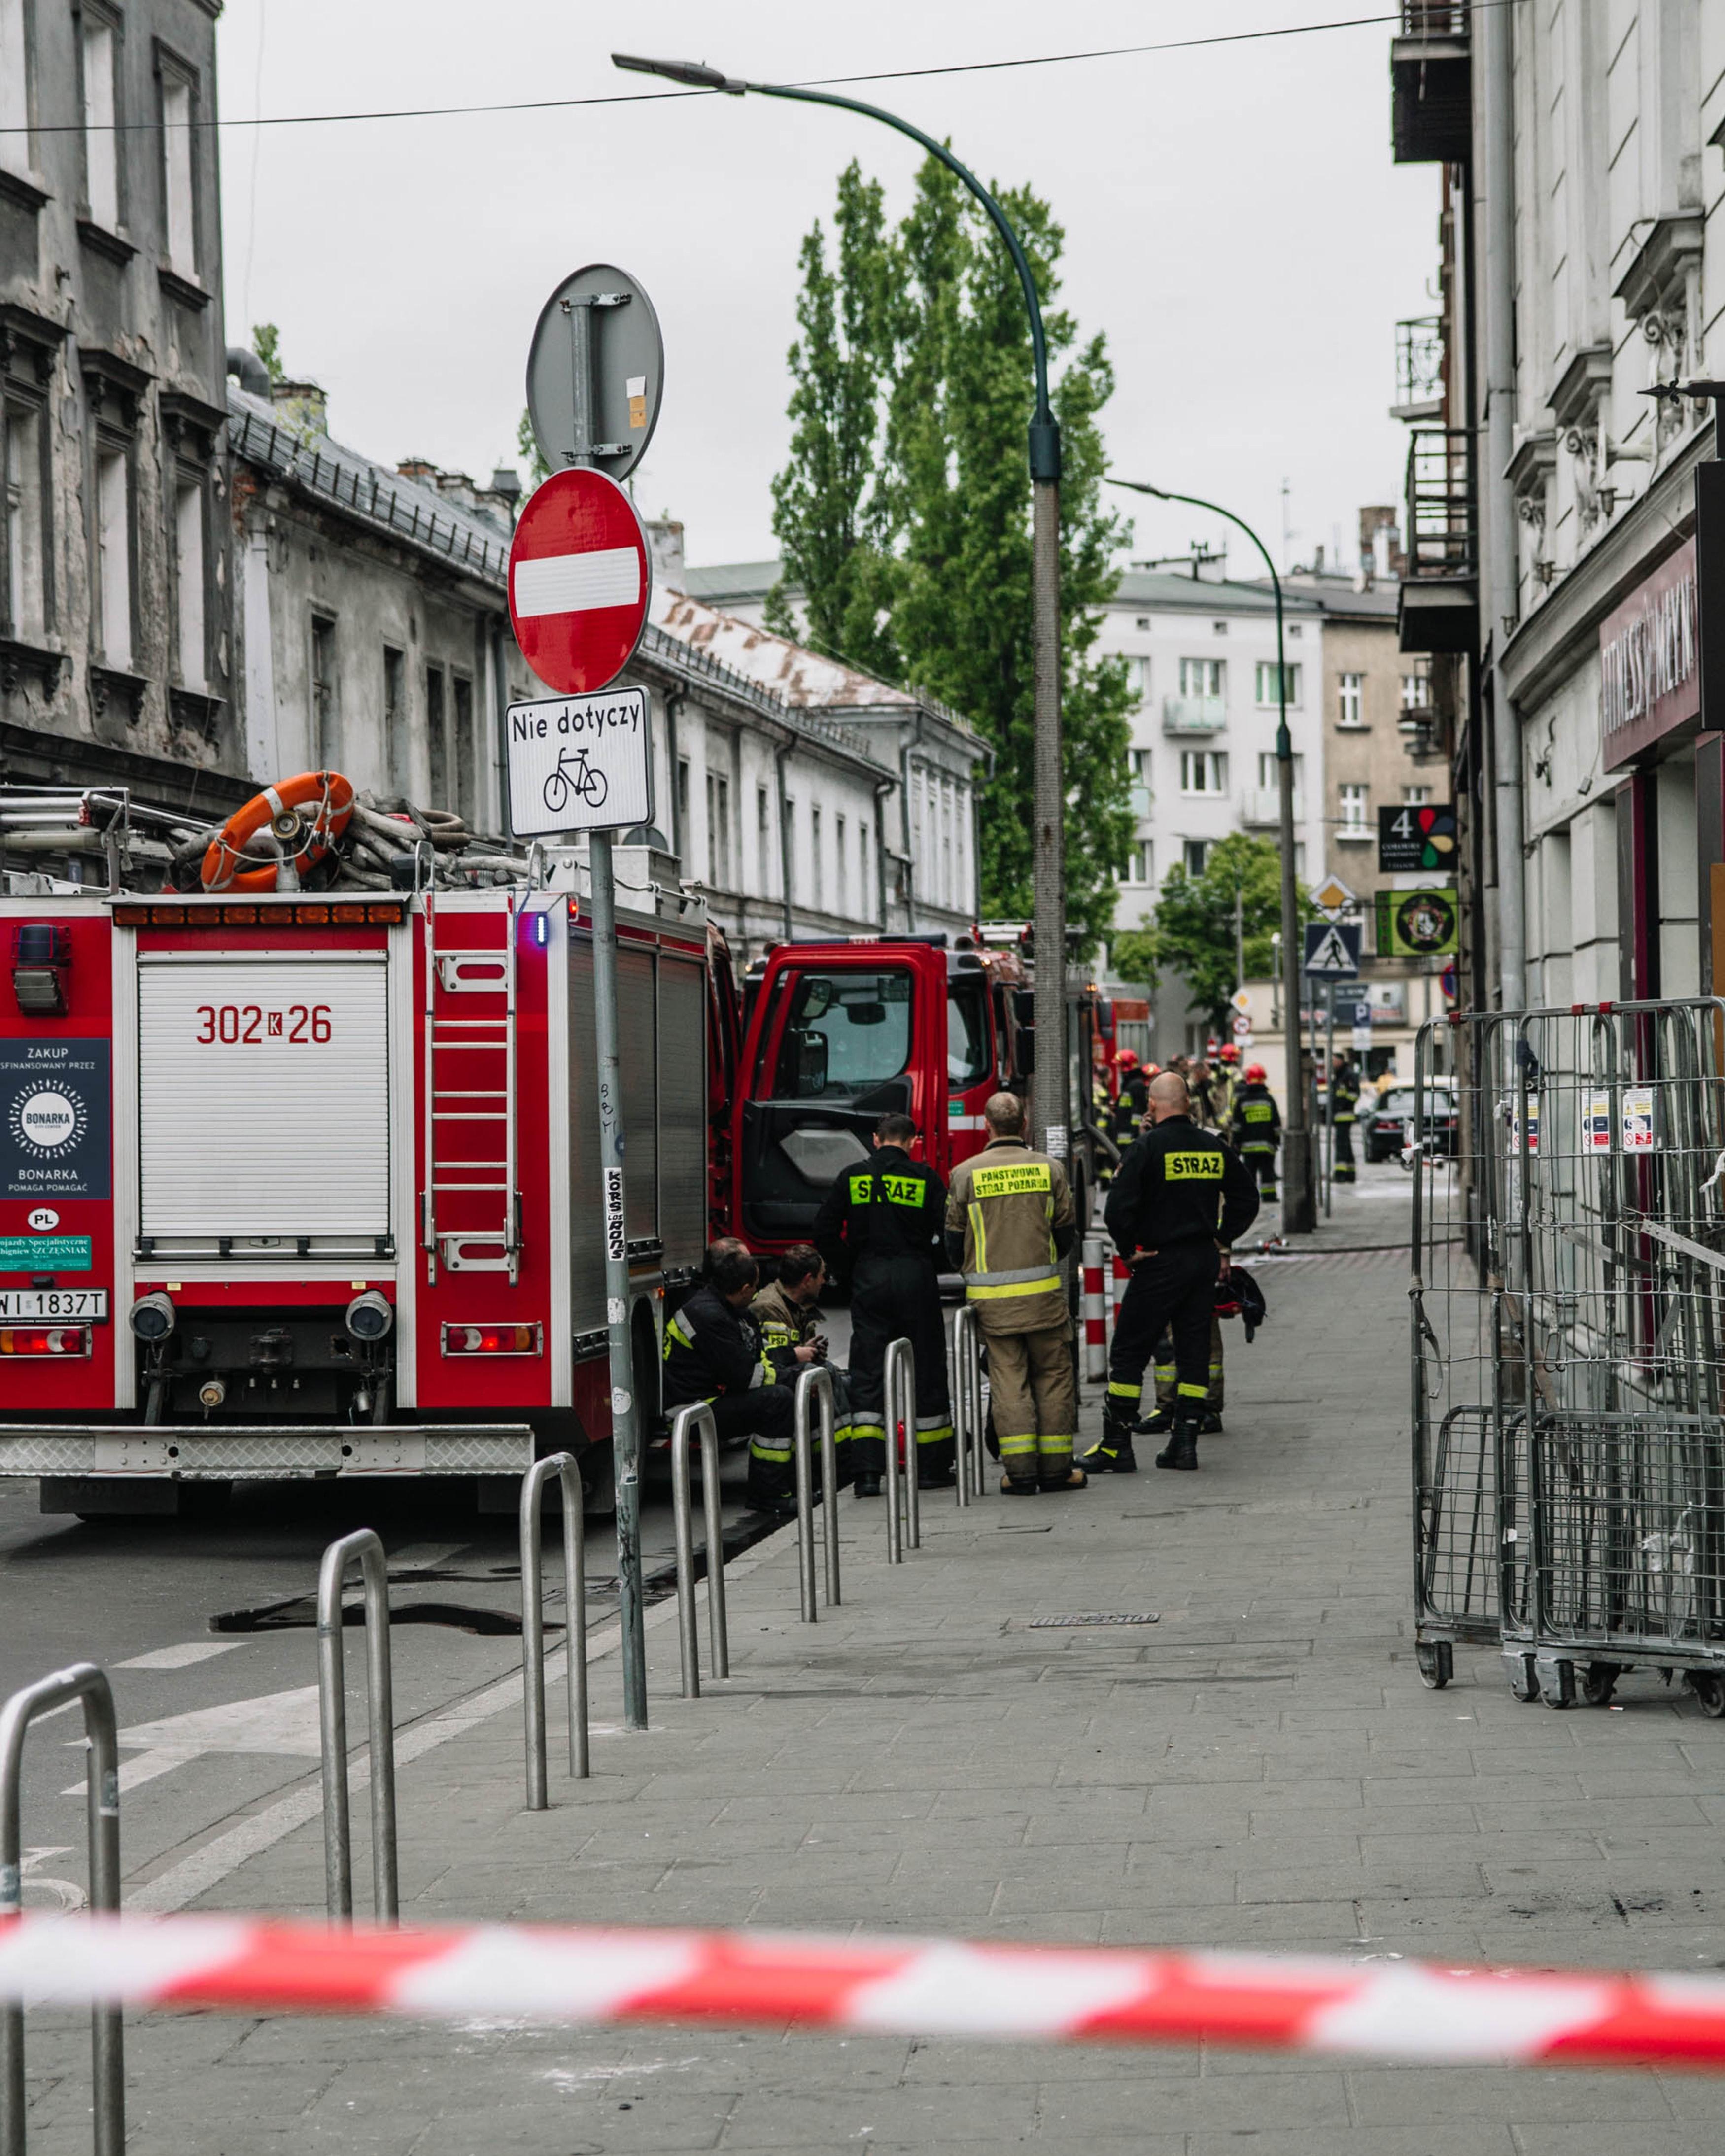 Fire brigade on a city street